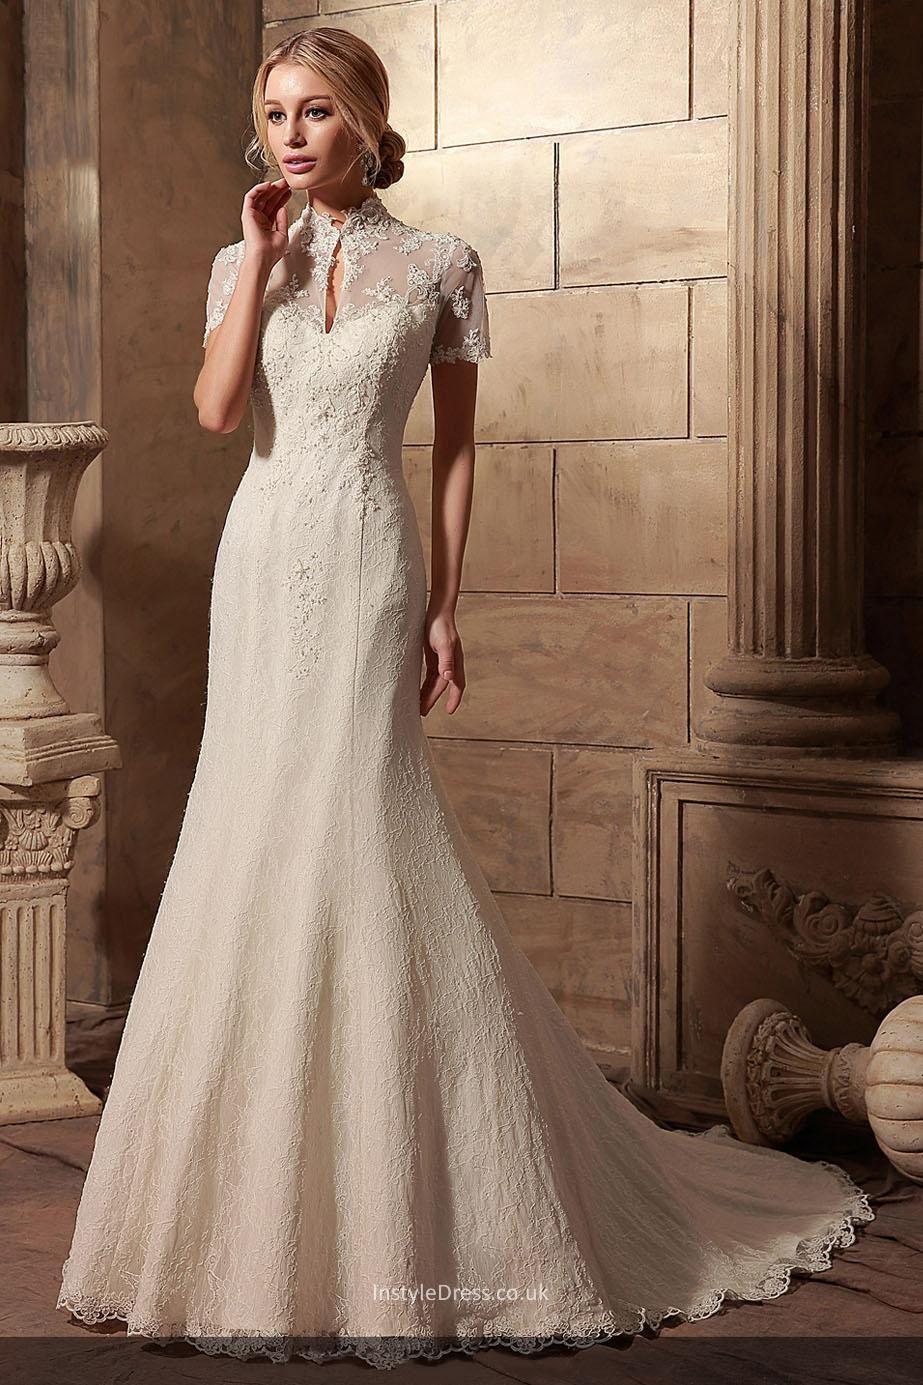 Vintage wedding dress under 500  Vintage Lace Short Sleeves High Neck Mermaid Wedding Dresses